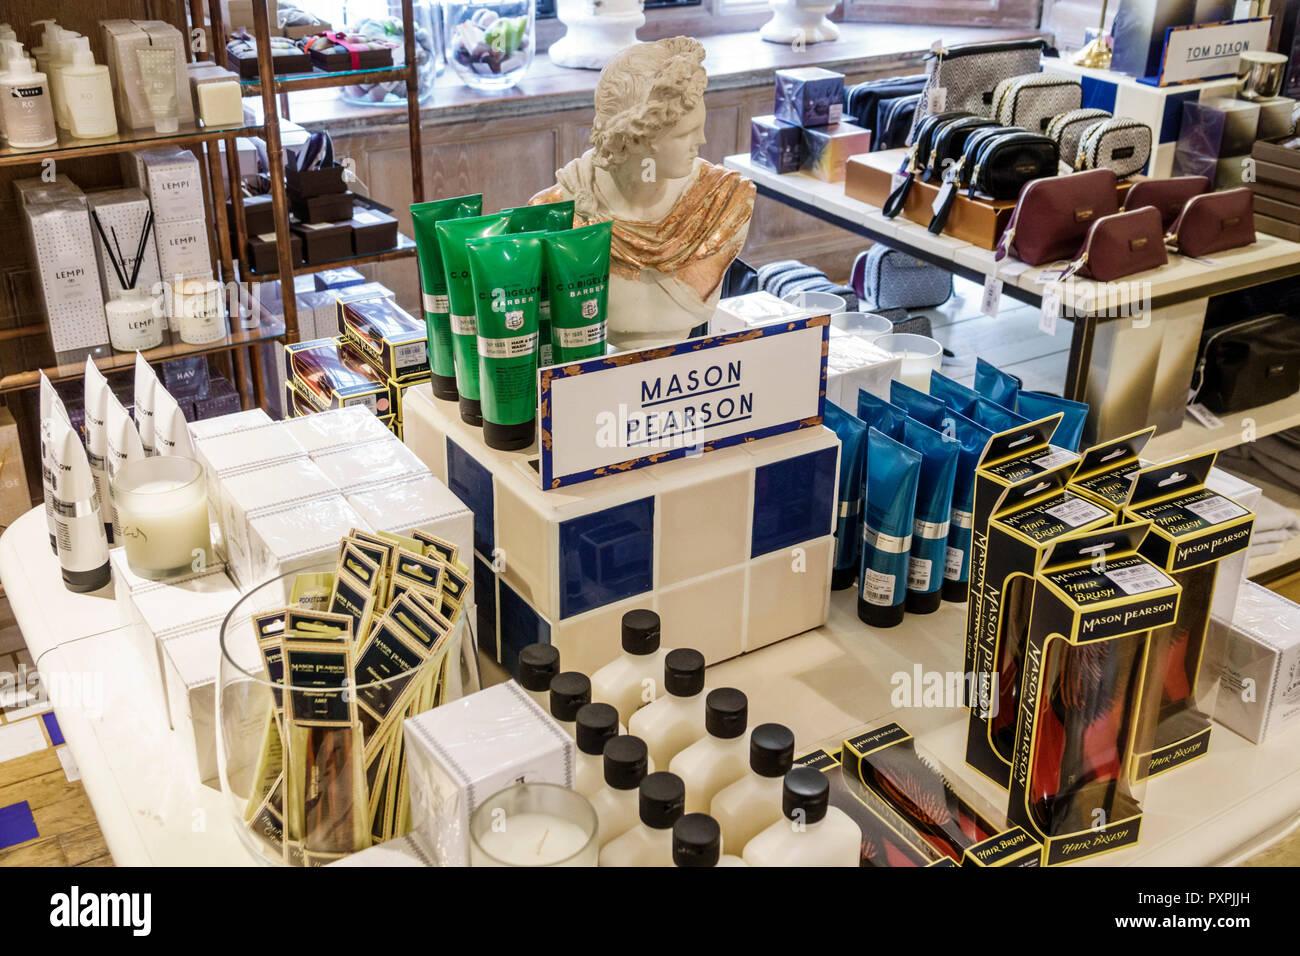 London England United Kingdom Great Britain Soho Liberty Department Store shopping luxury brands upmarket gifts personal care Mason Pearson hairbrushe - Stock Image